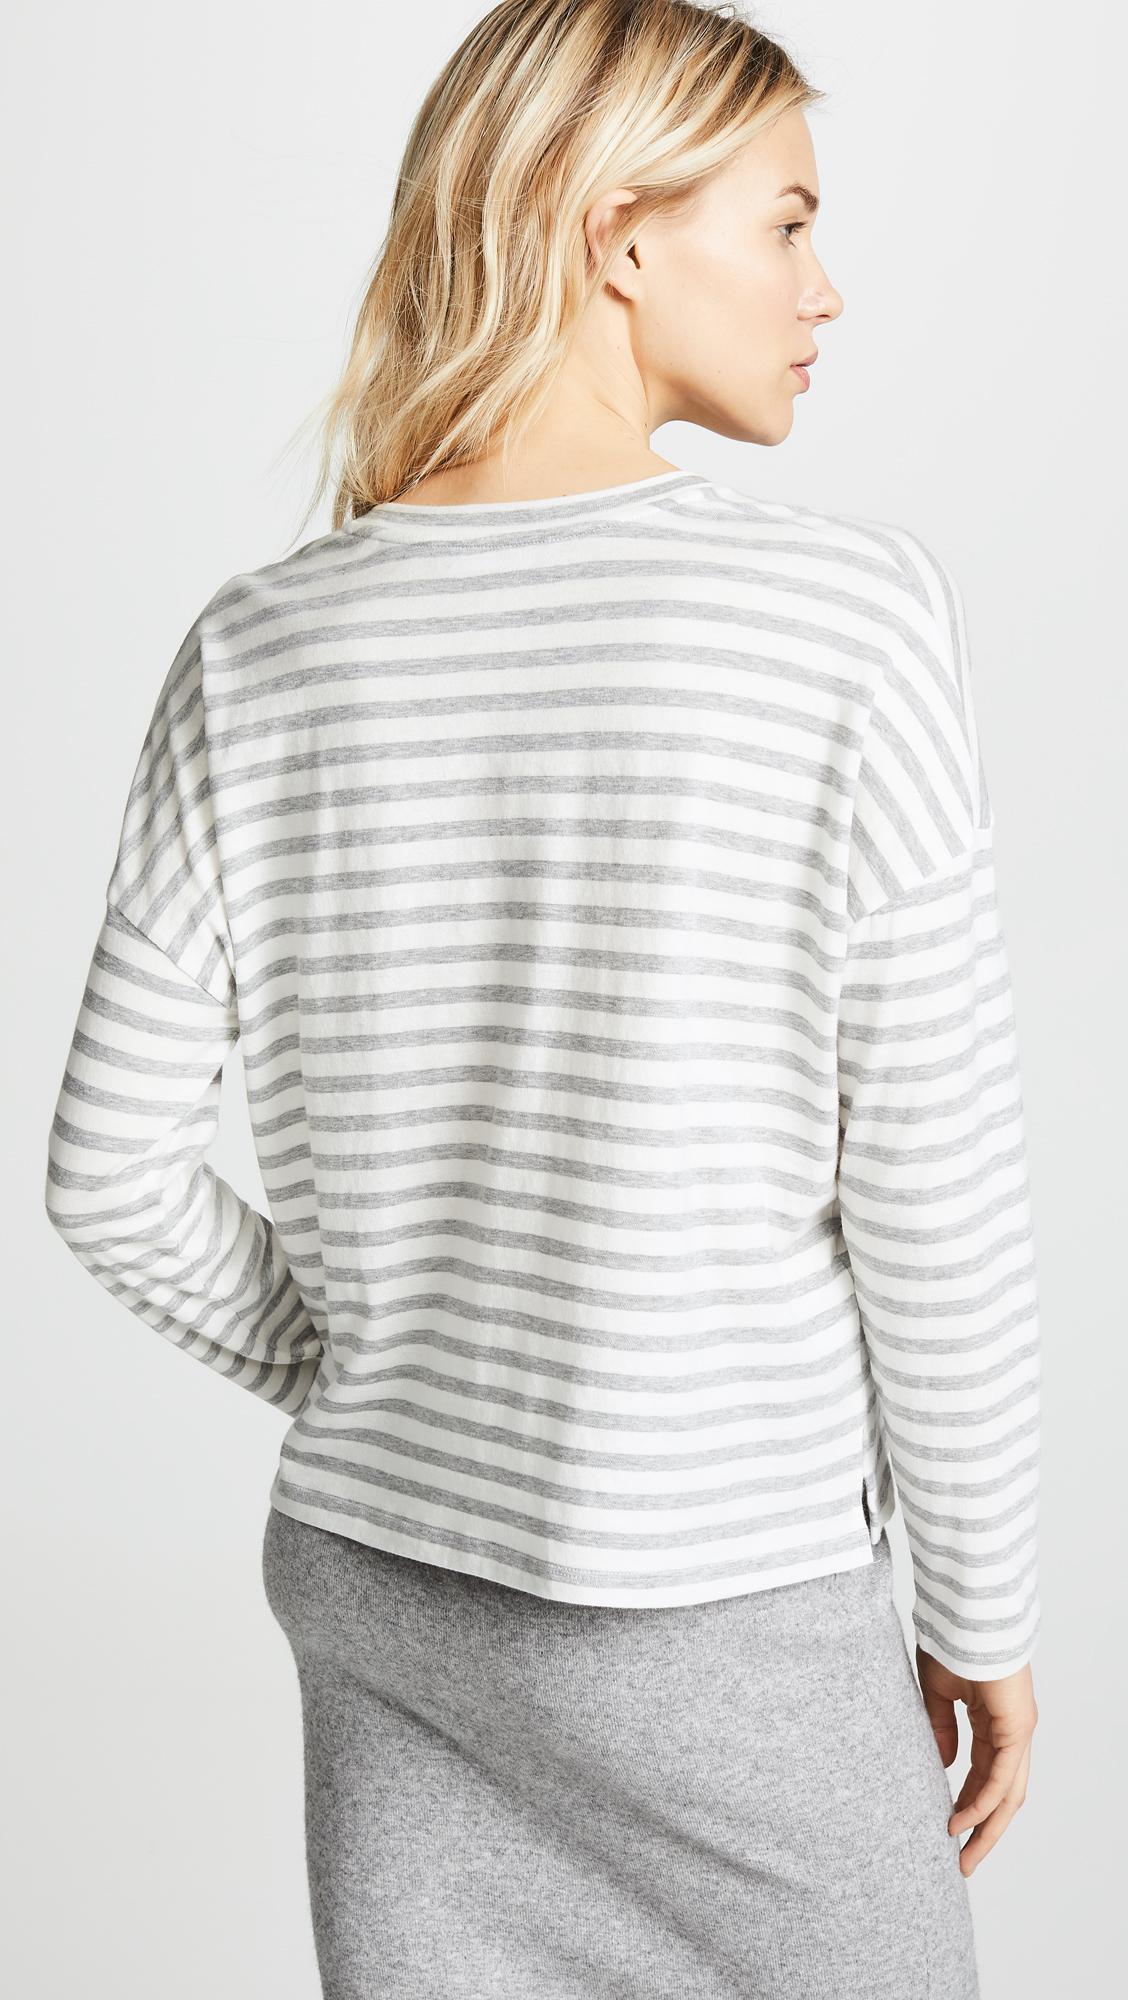 5b0e385ec1 Vince - White Bengal Stripe Long Sleeve Tee - Lyst. View fullscreen